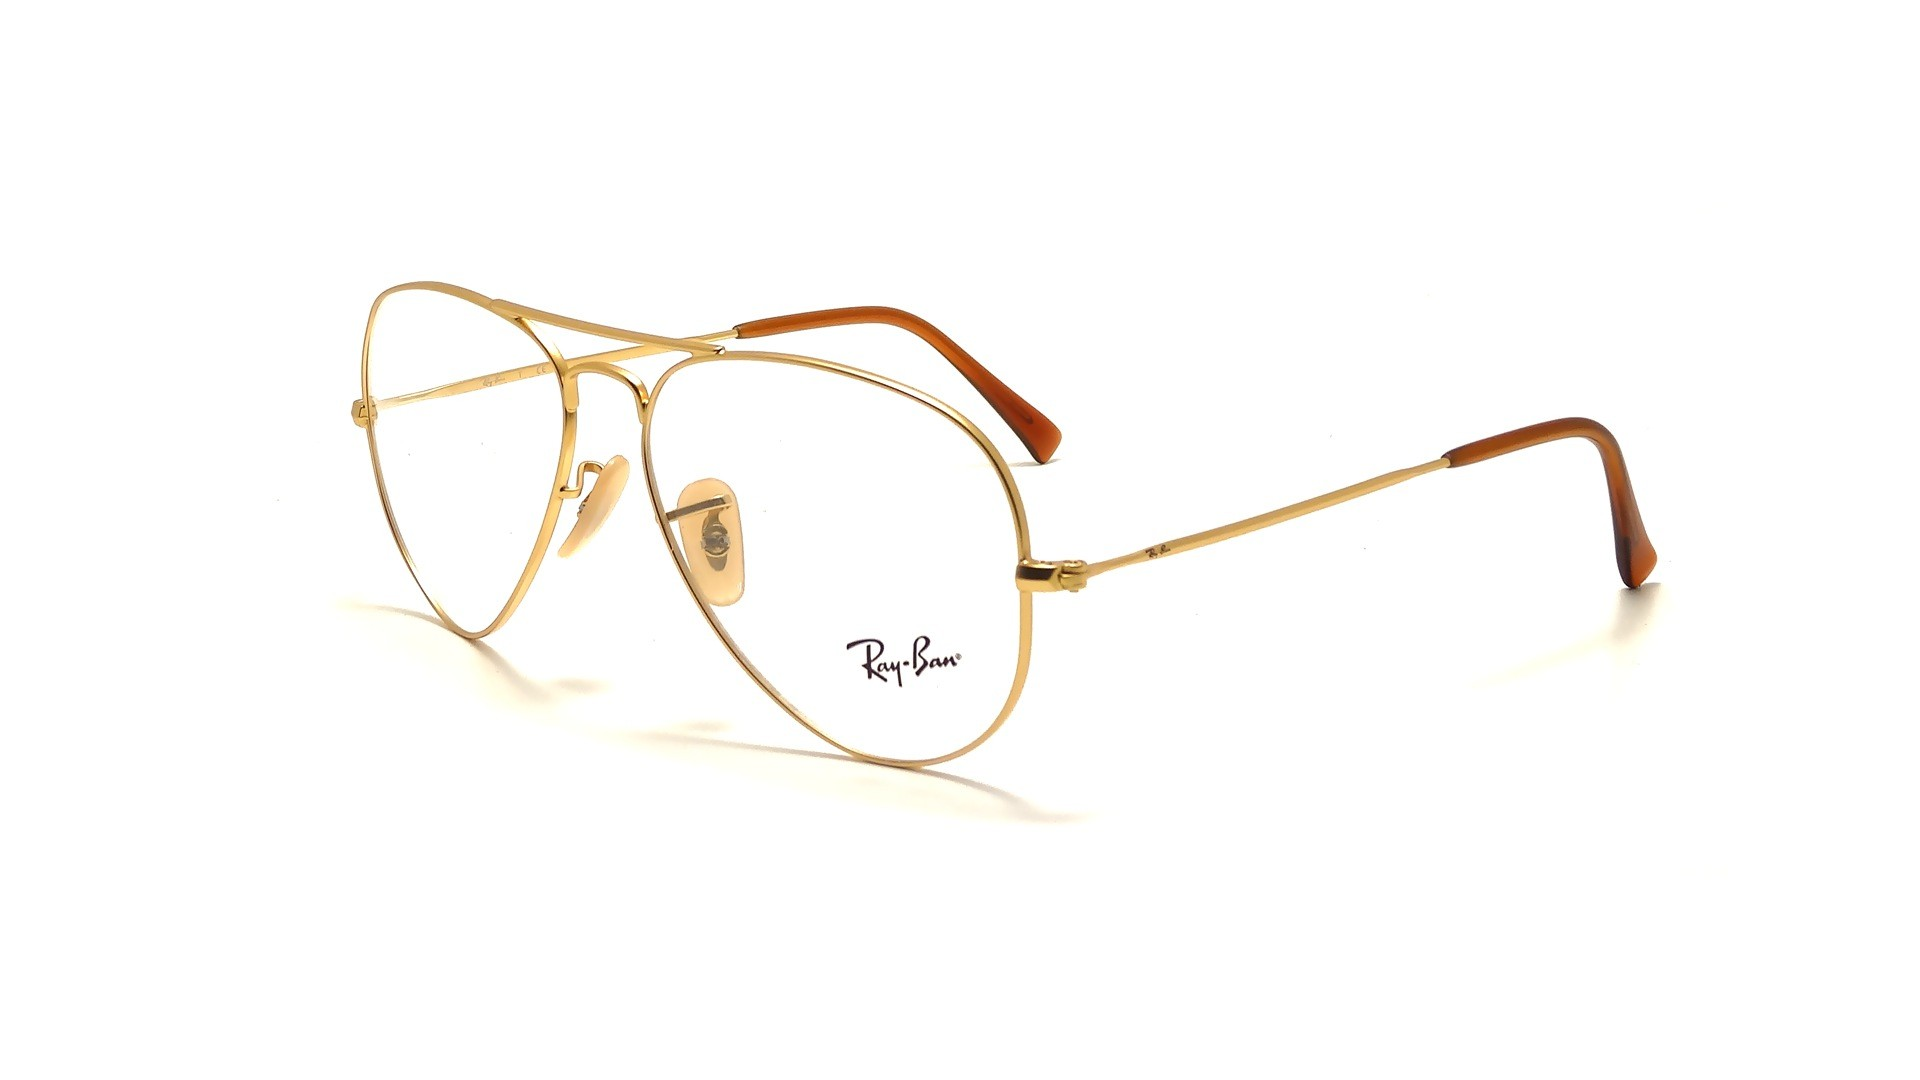 Ray Ban Large Frame Glasses : ray ban aviator glasses frames